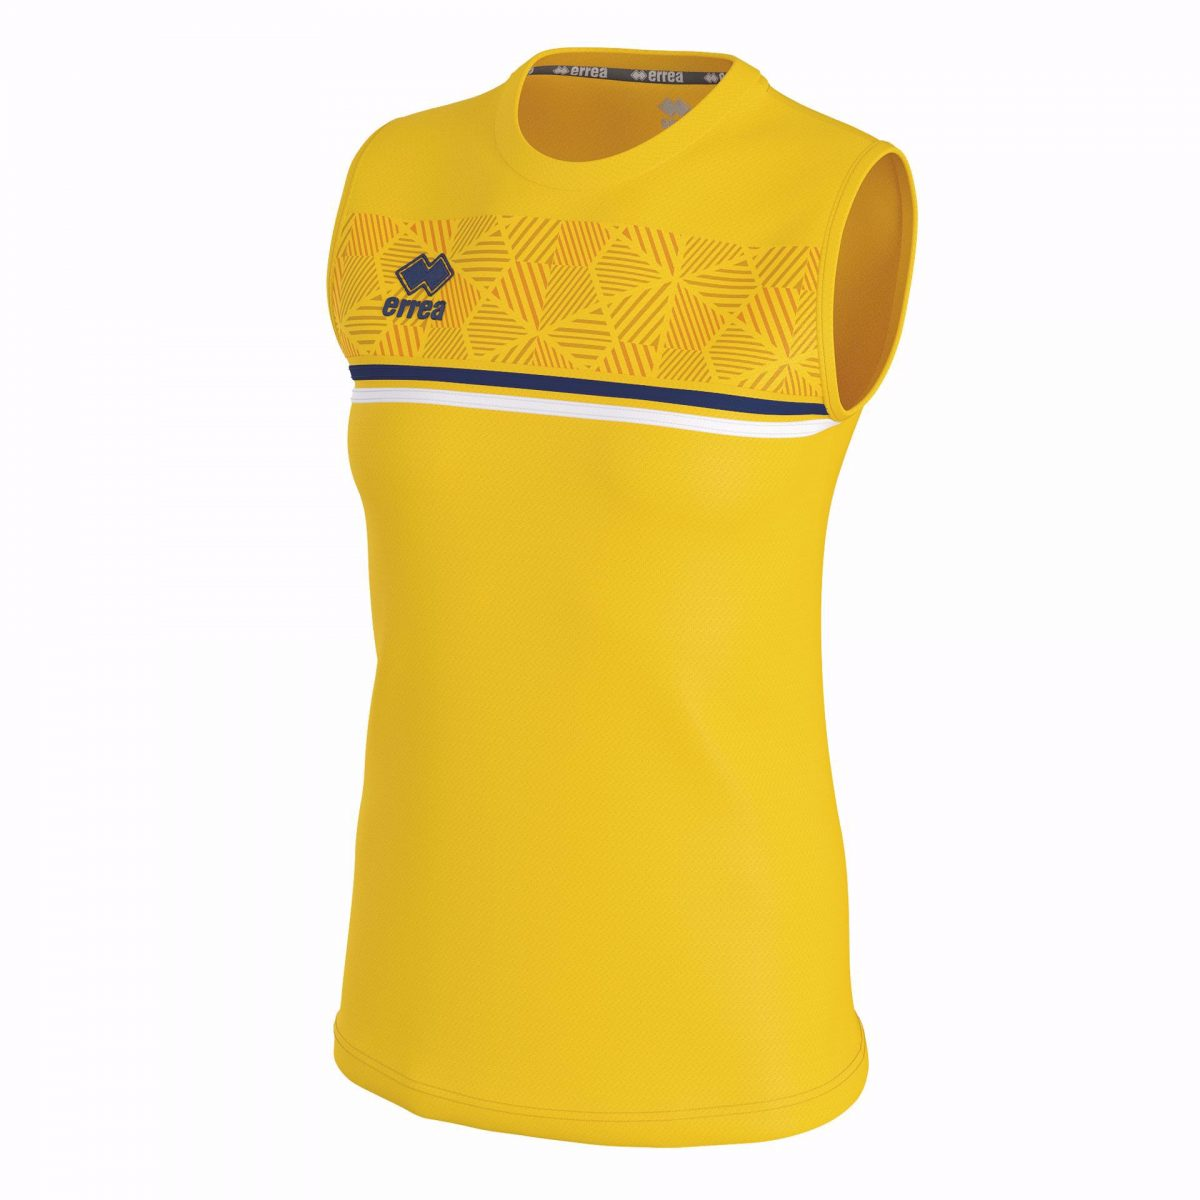 Errea Divina Womens Short Sleeve Junior Shirt - FM881S